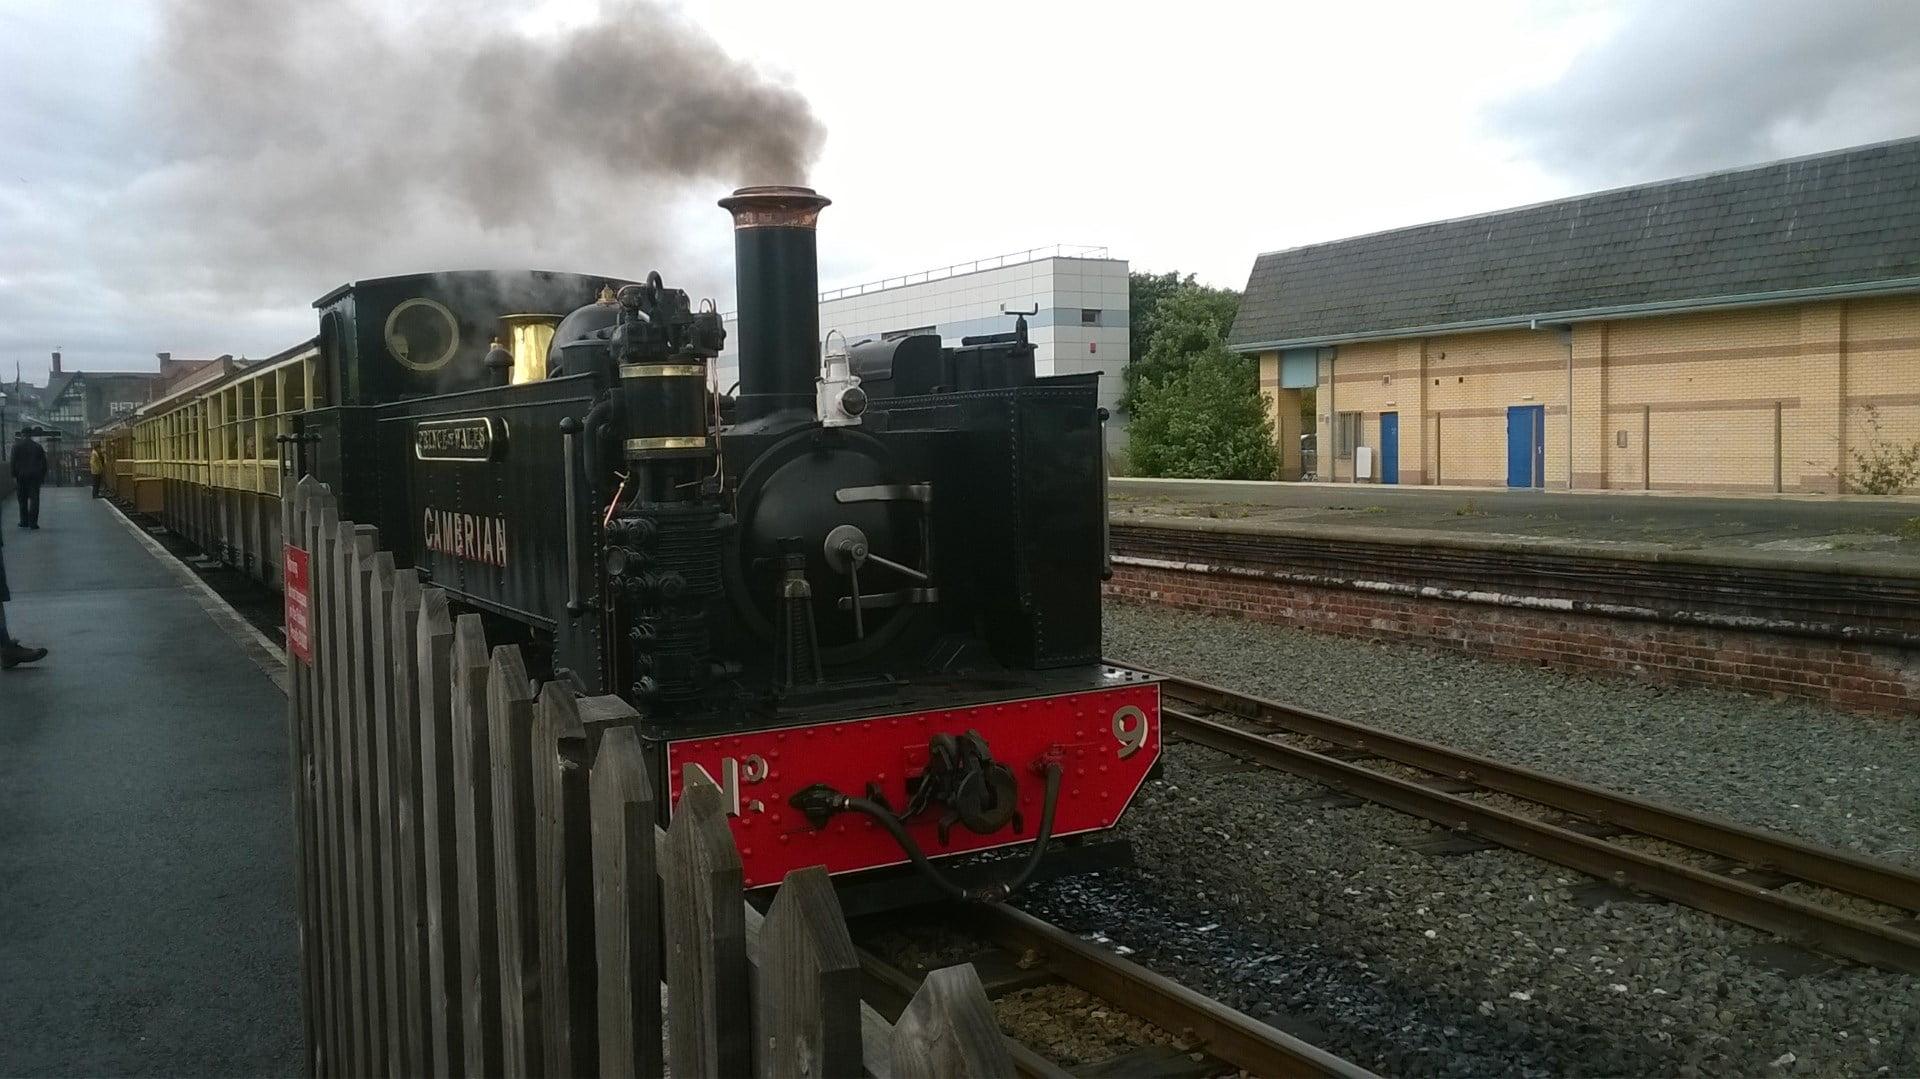 No. 9 Prince of Wales on the Vale of Rheidol Railway